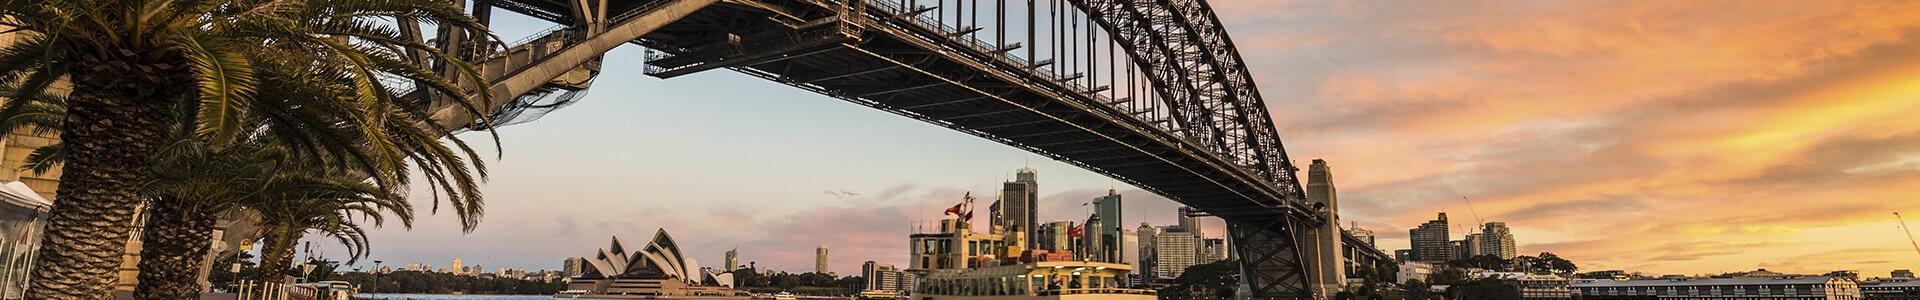 Voyage en Australie - TUI